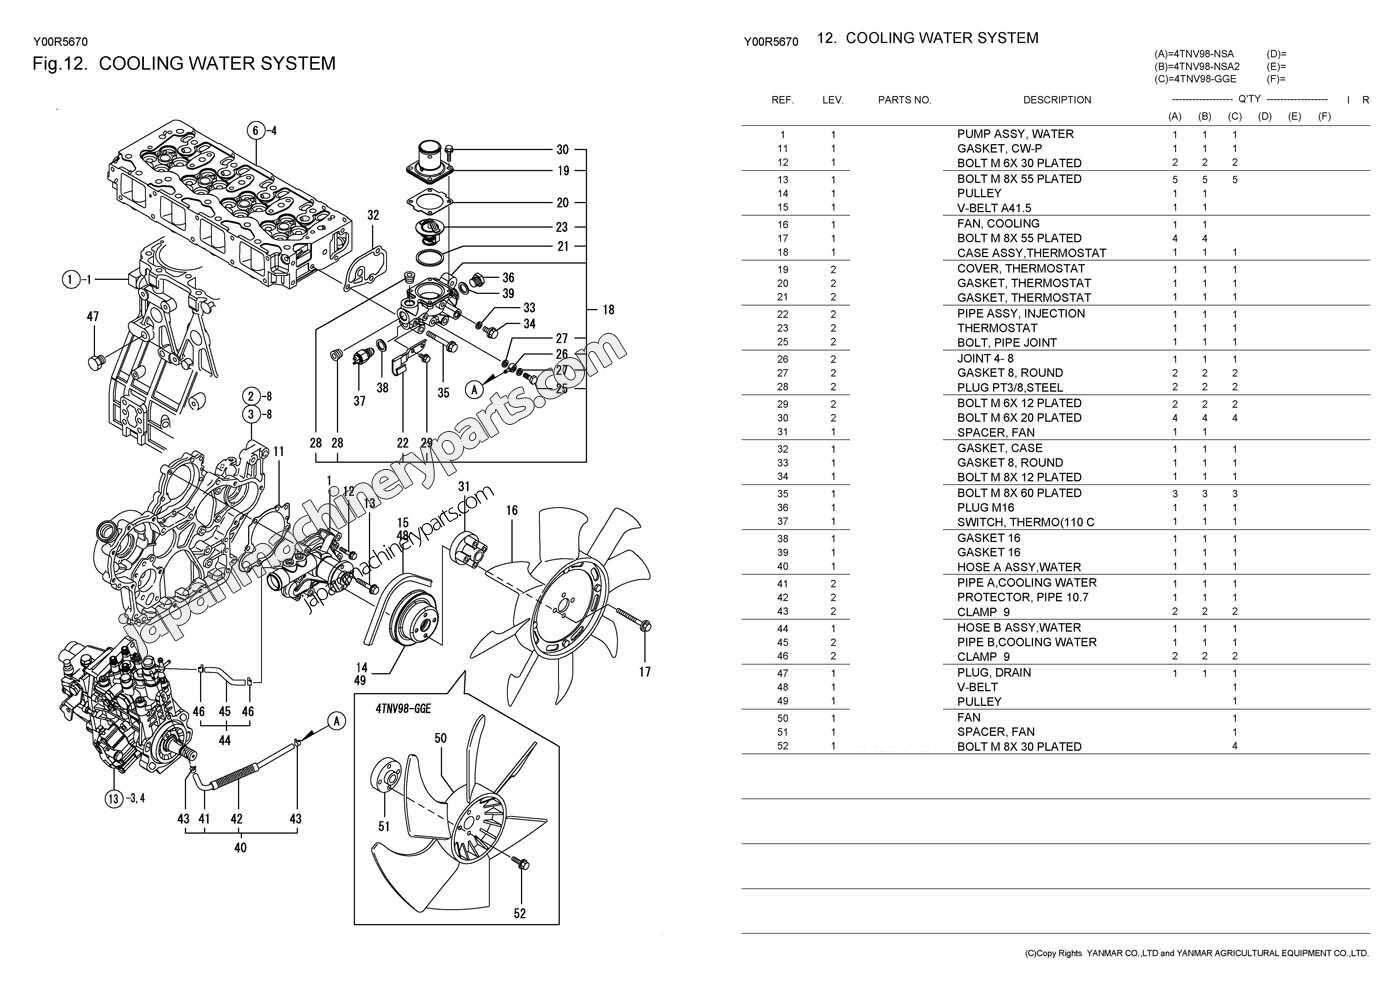 hight resolution of yanmar 4tnv wiring diagrams wiring diagrams bib yanmar 4tnv88 wiring diagram yanmar 4tnv wiring diagrams